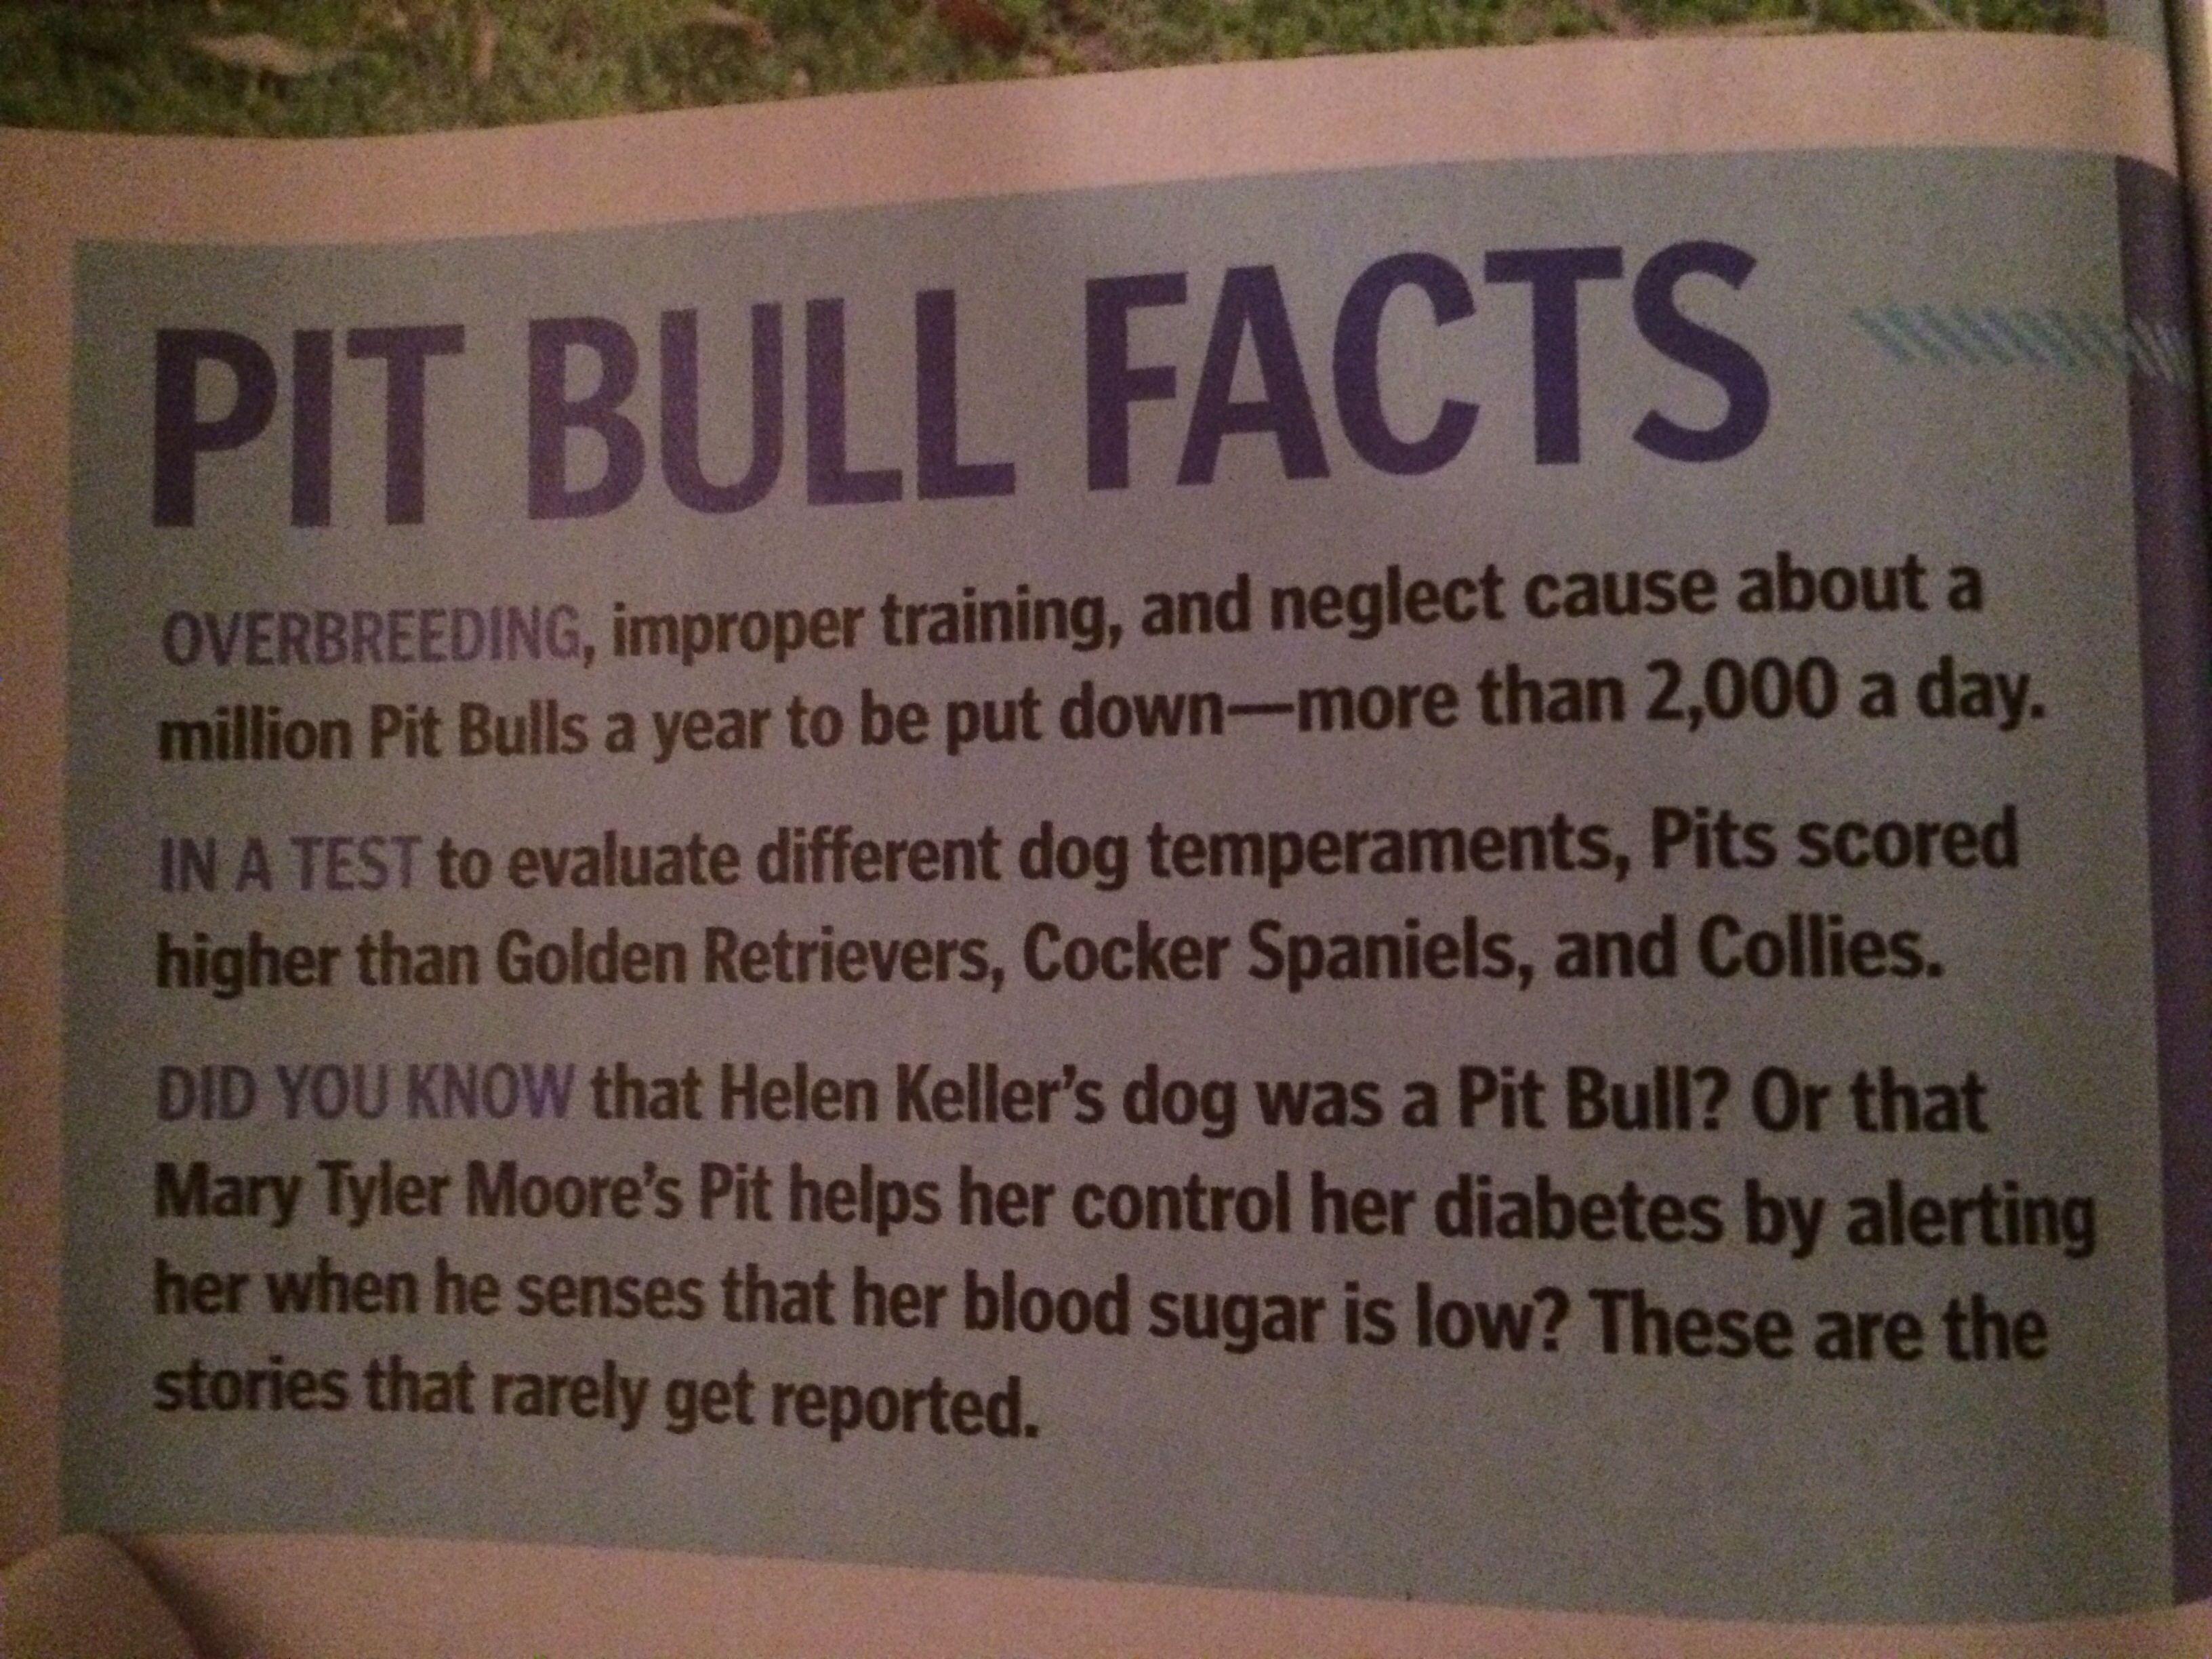 Pitbull facts